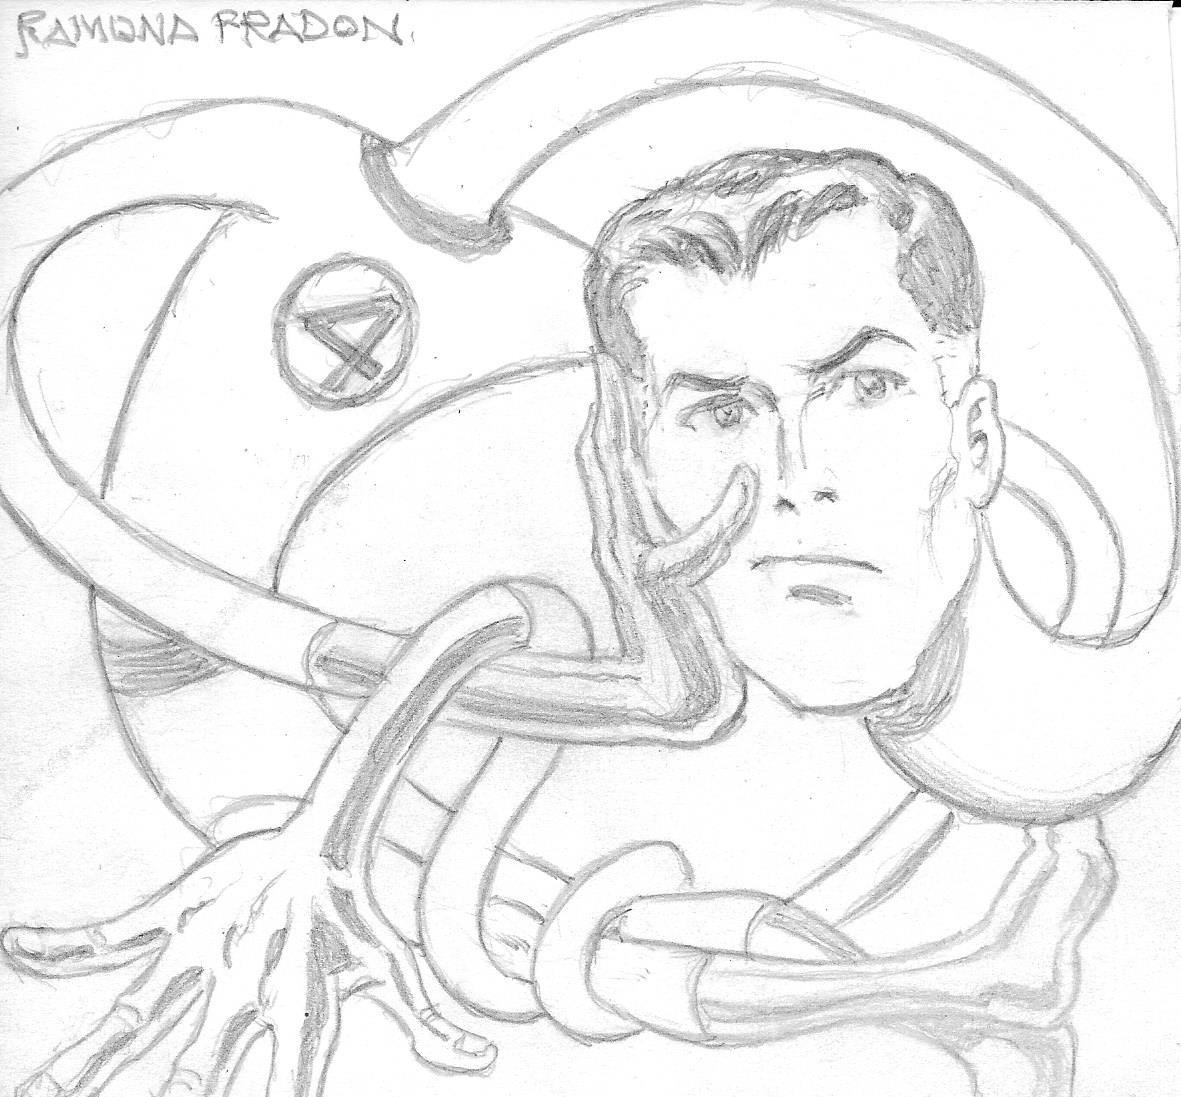 Mr Fantastic Of Fantastic Four By Ramona Fradon